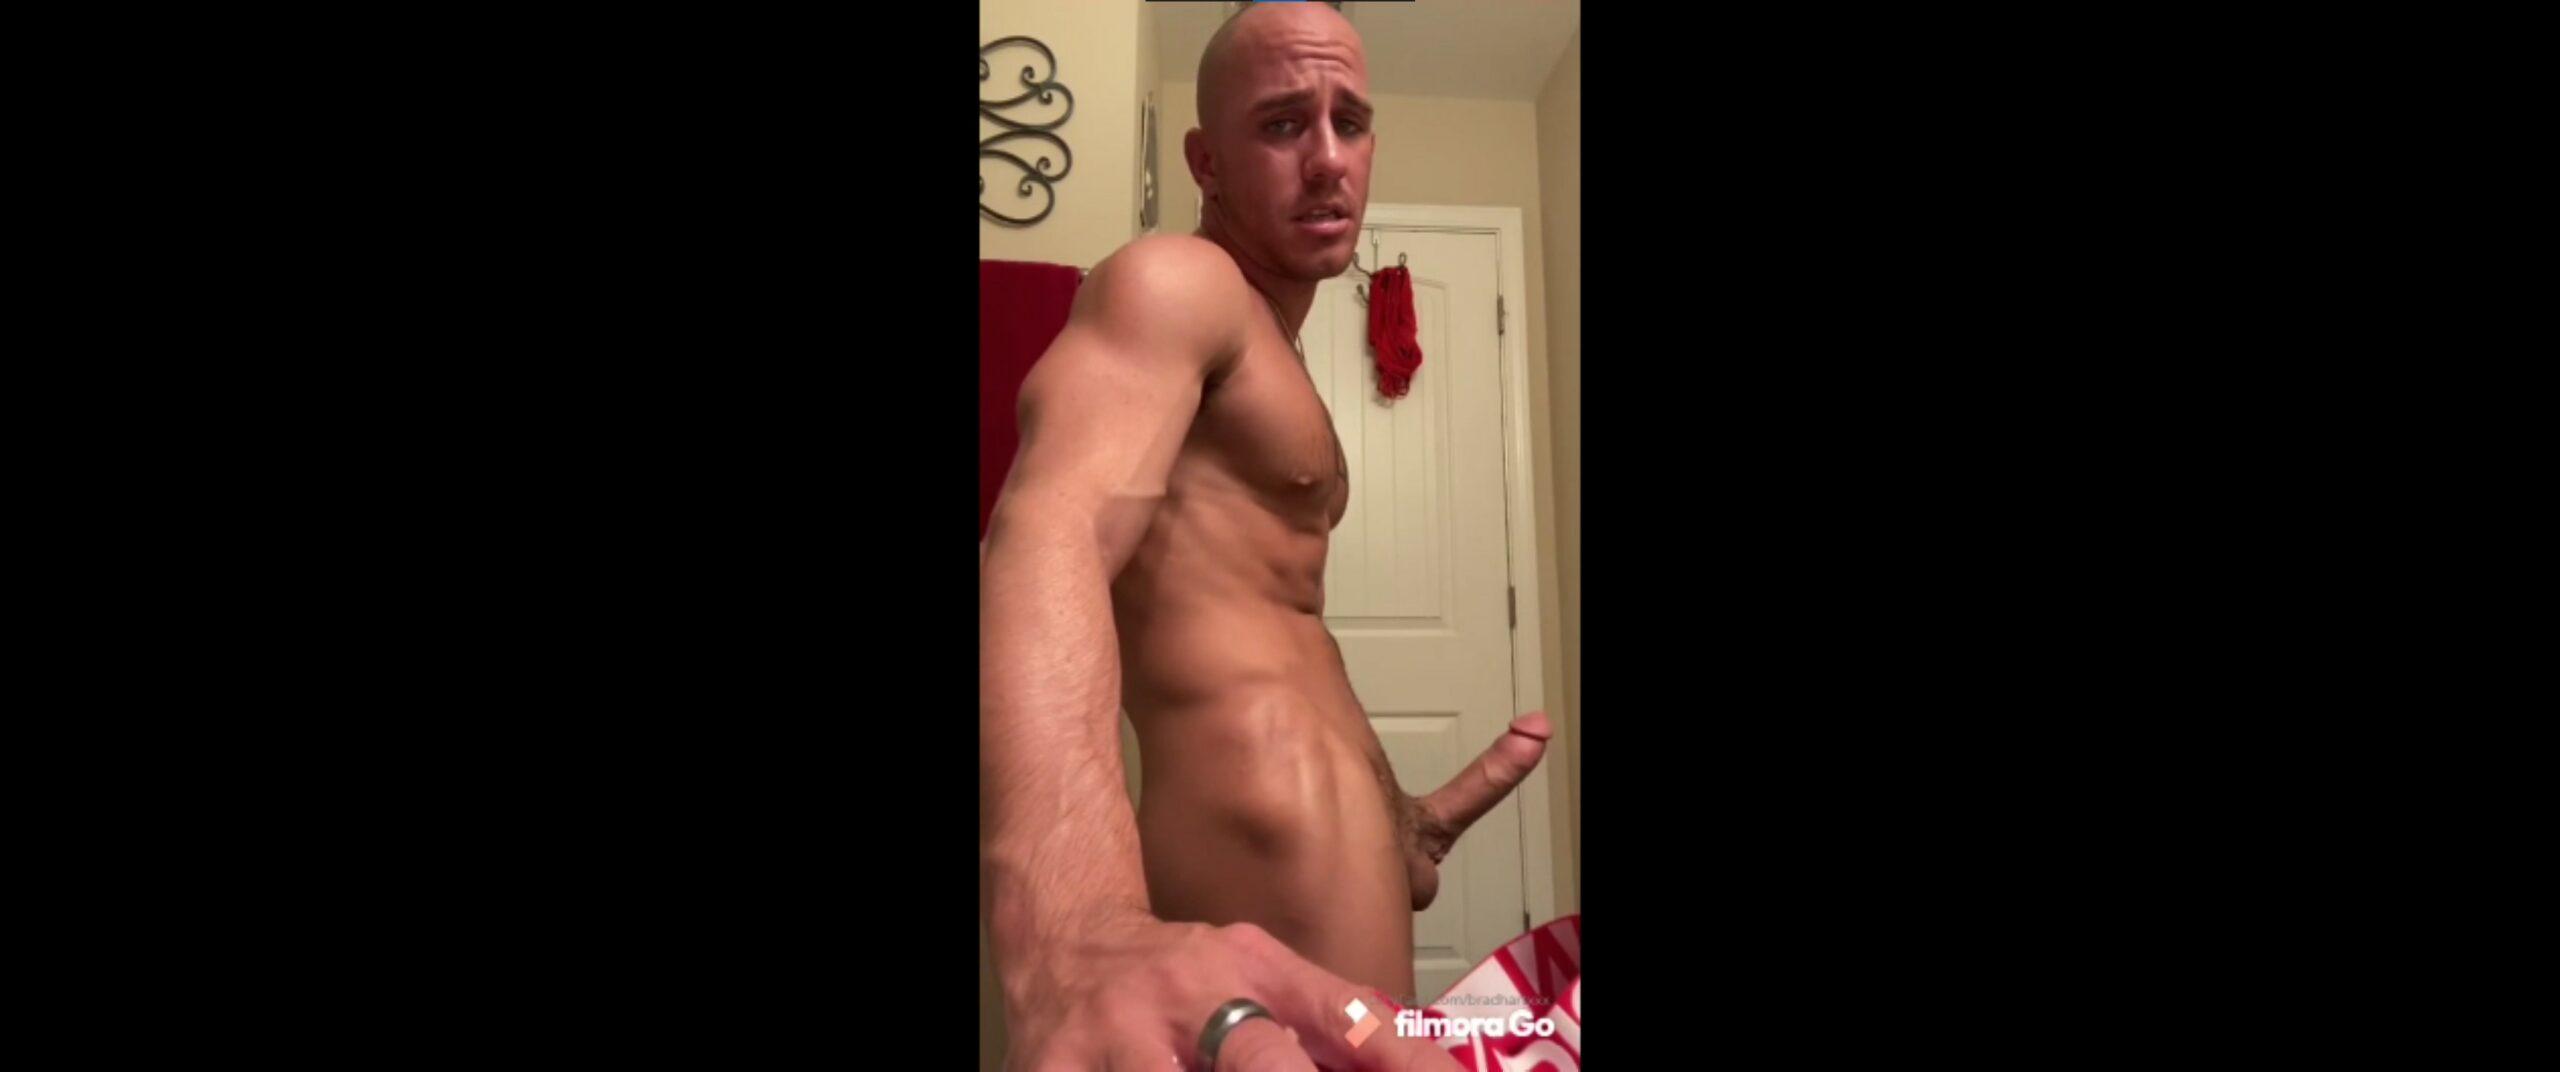 Jerking off hard and cumming over my underwear - Brad Hart (BradHartXXX)